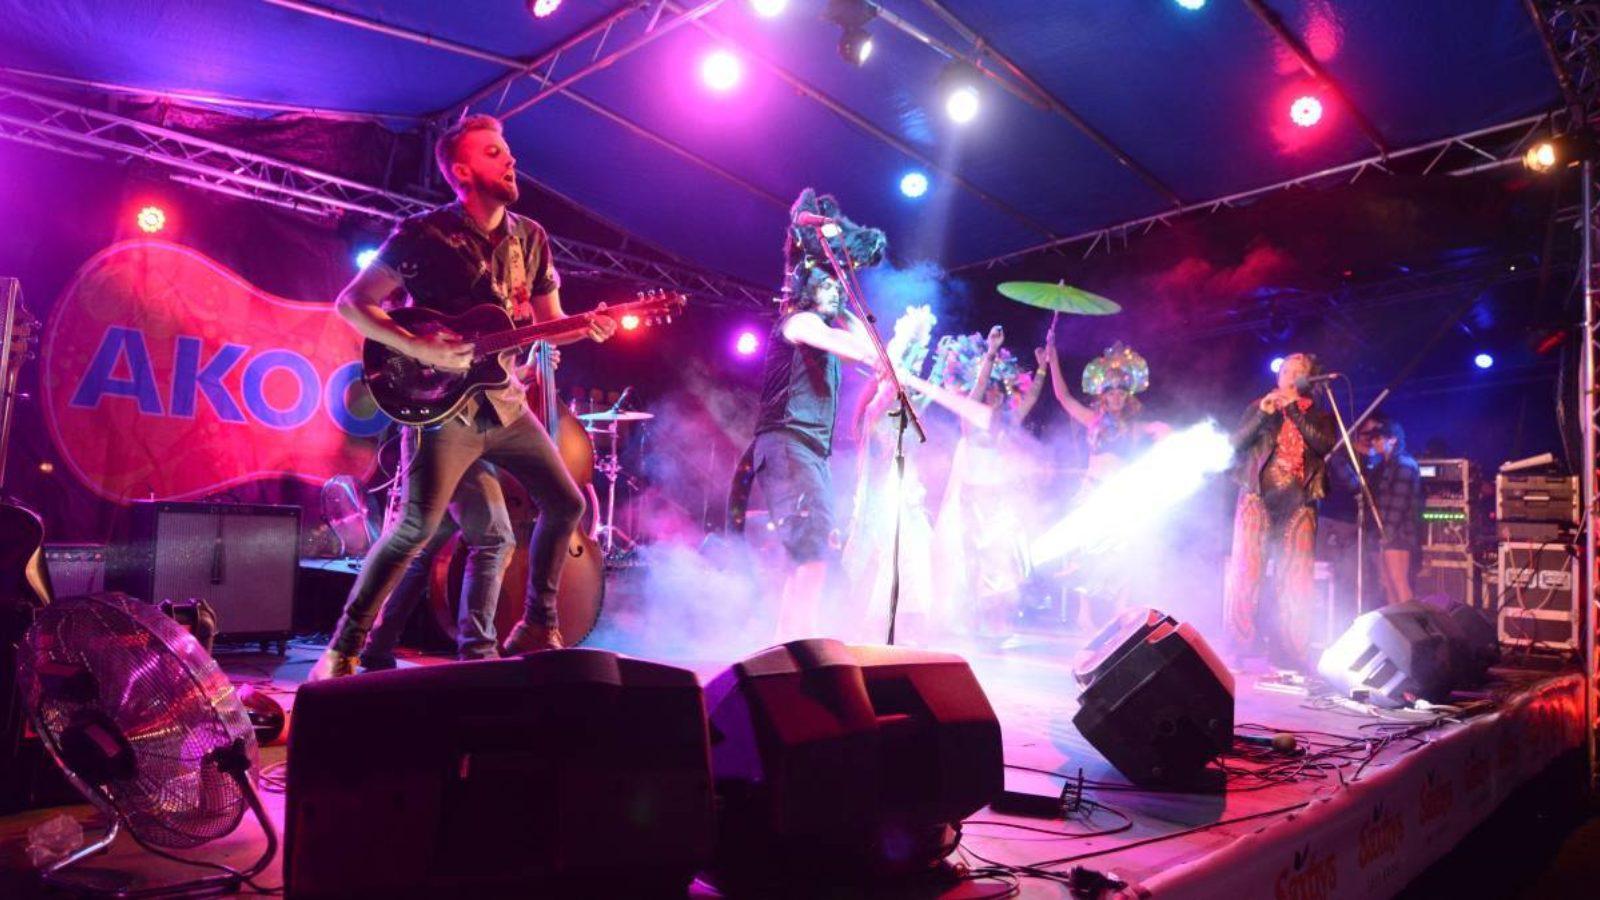 Wingham Akoostik Music Festival stage at night